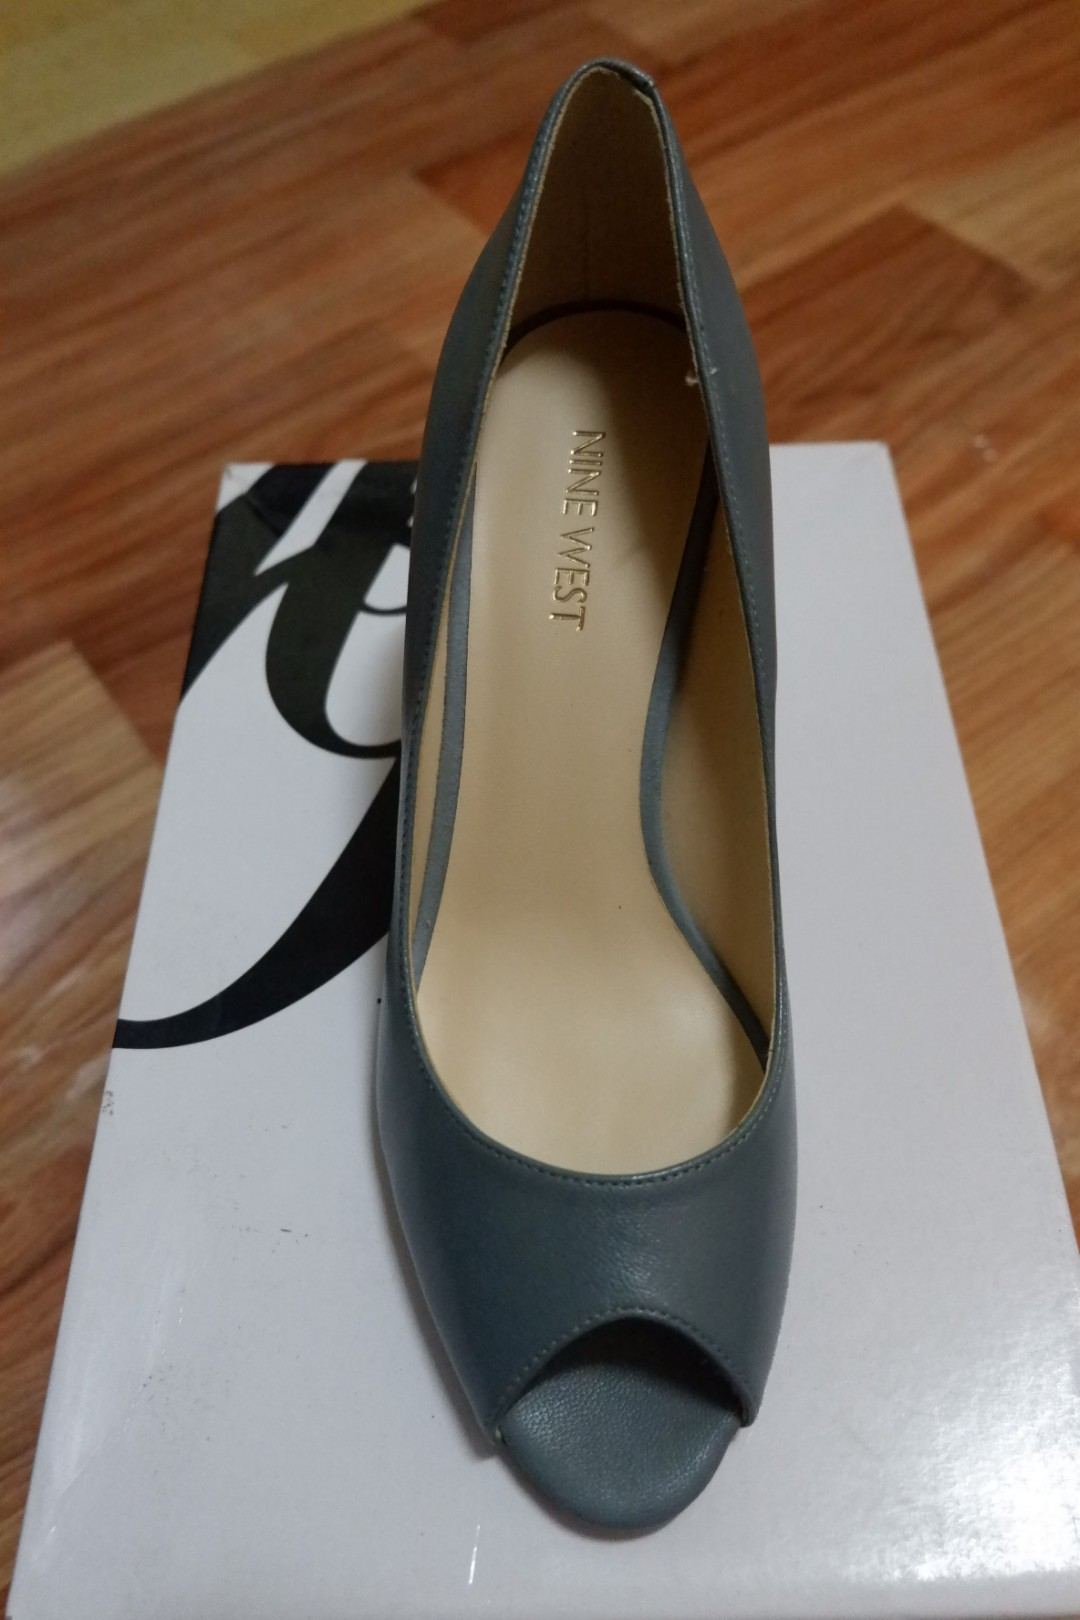 01120f2c21 NINE WEST ORISSA PEEP TOE SIZE 36 1/2, Women's Fashion, Shoes on Carousell